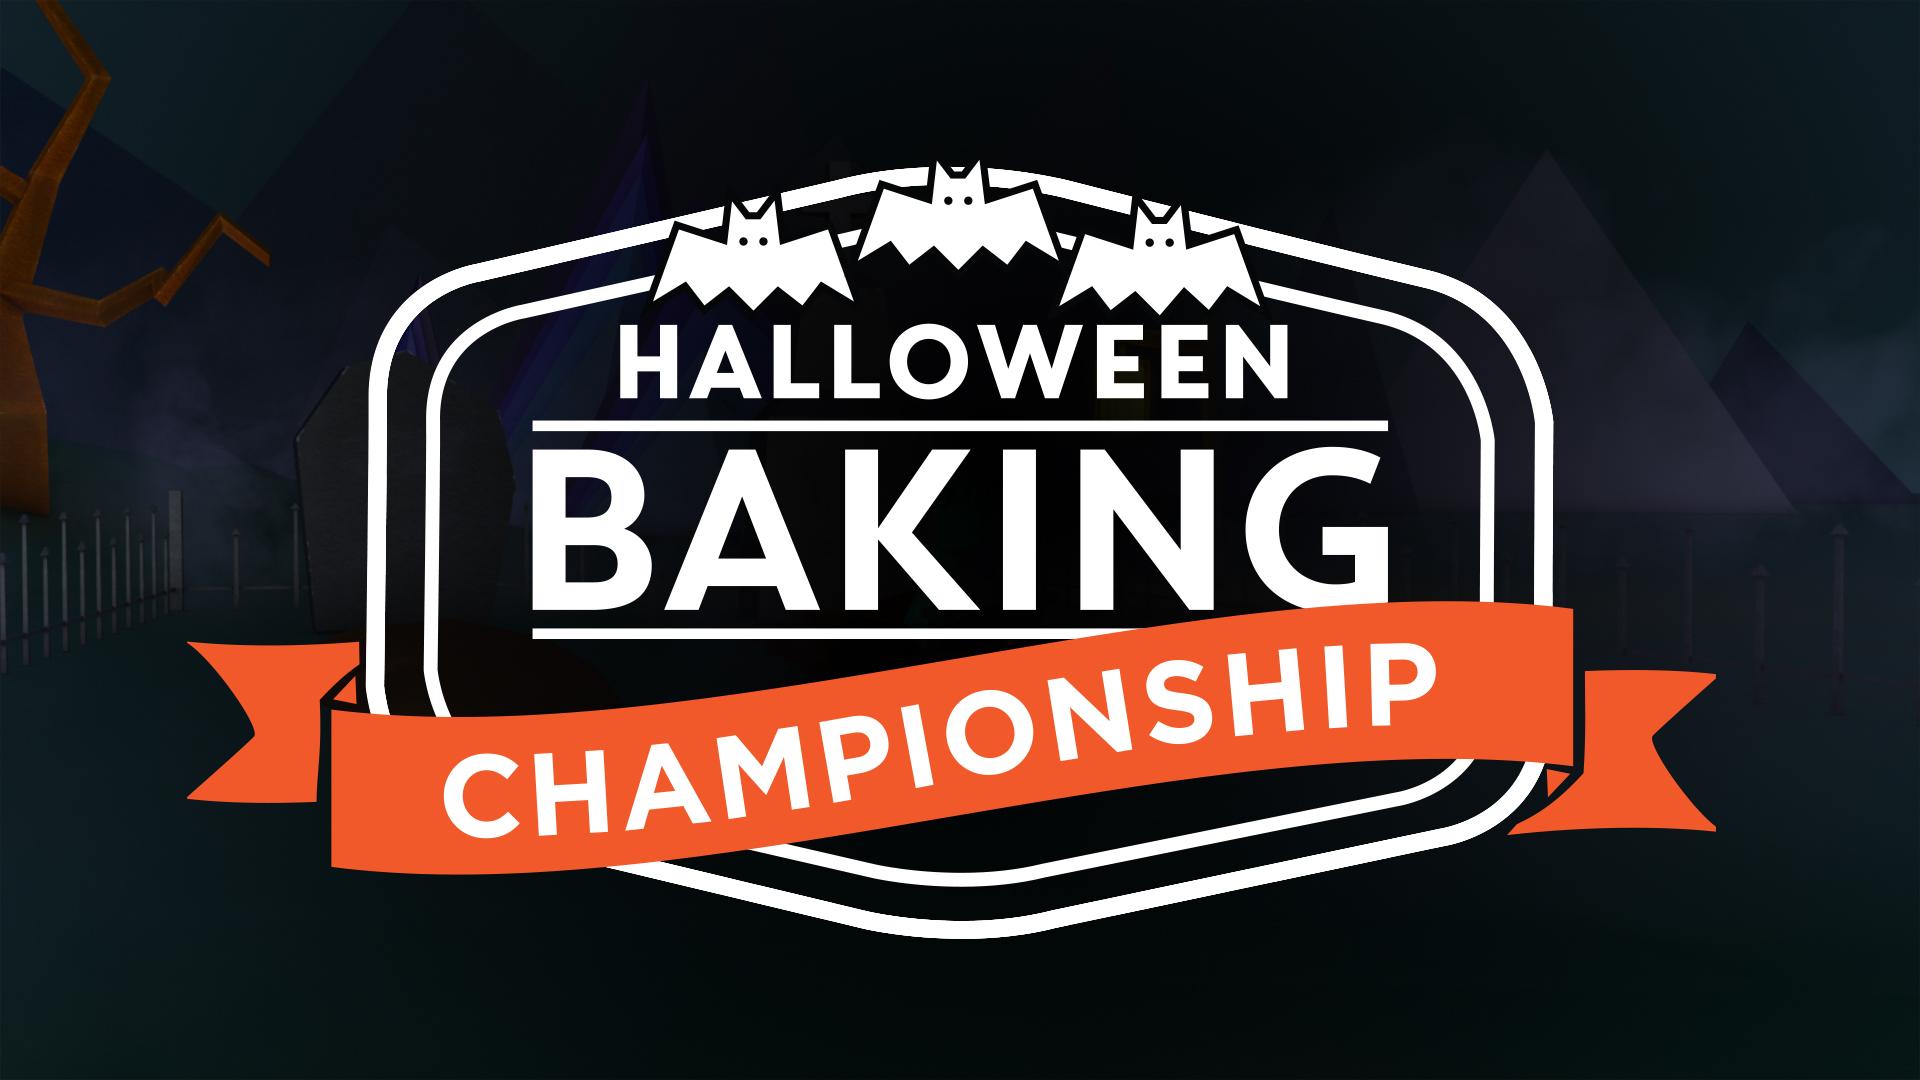 Halloween Baking Championship Trailer 2020 Halloween Baking Championship' 2016 Season, 'Kids' Spinoff Announced